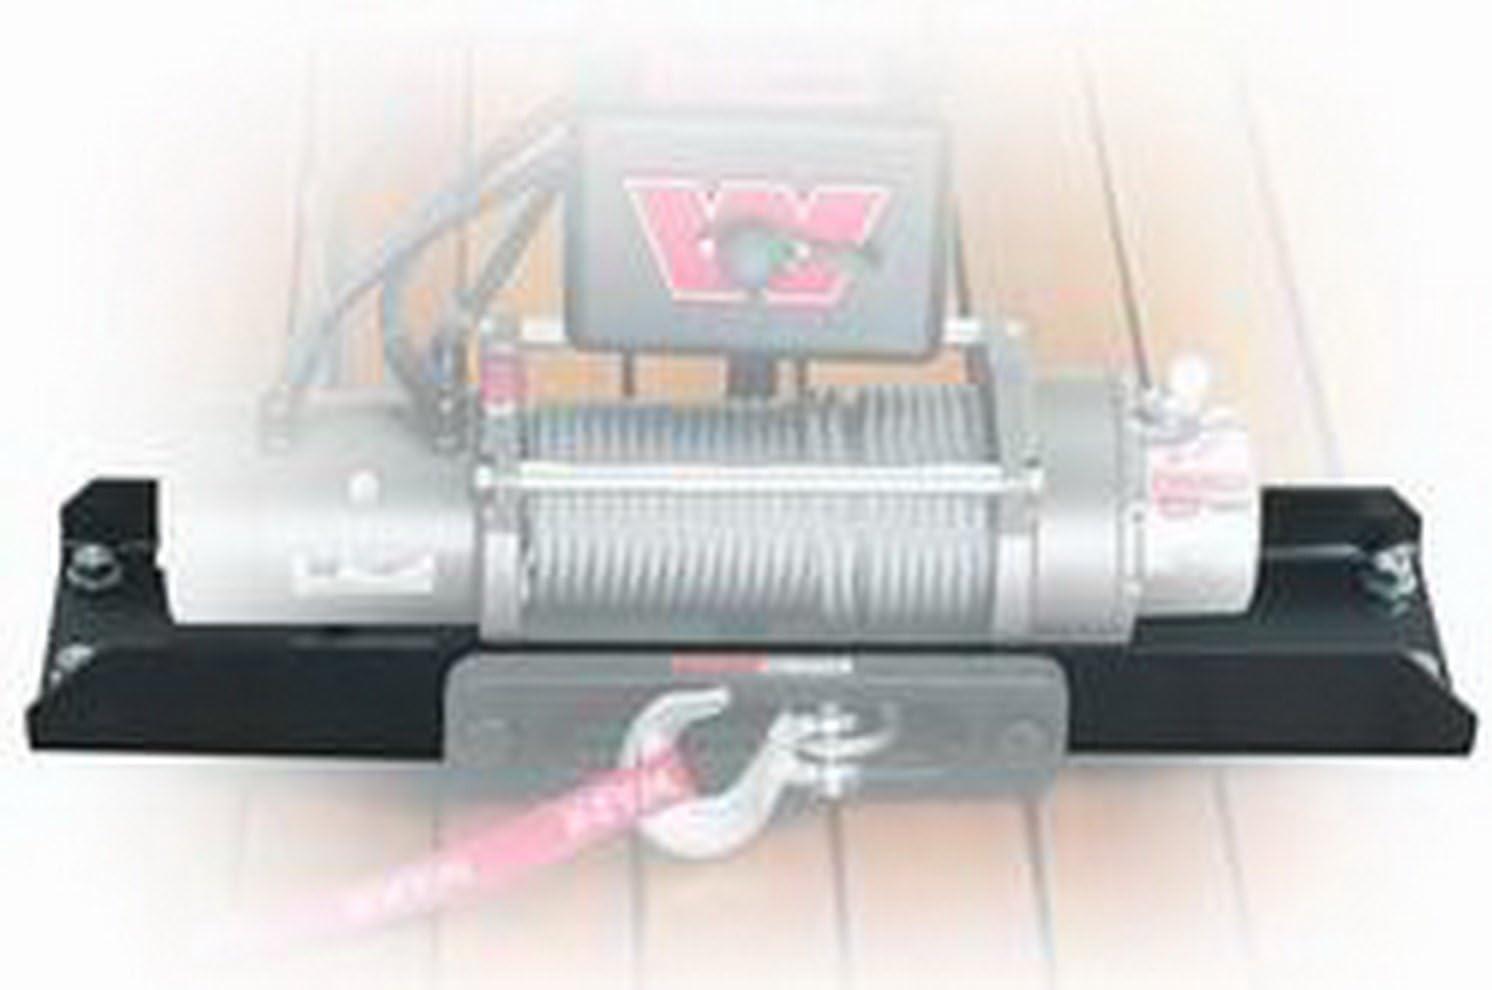 WARN 13942 Universal Foot Down Winch Mount Kit